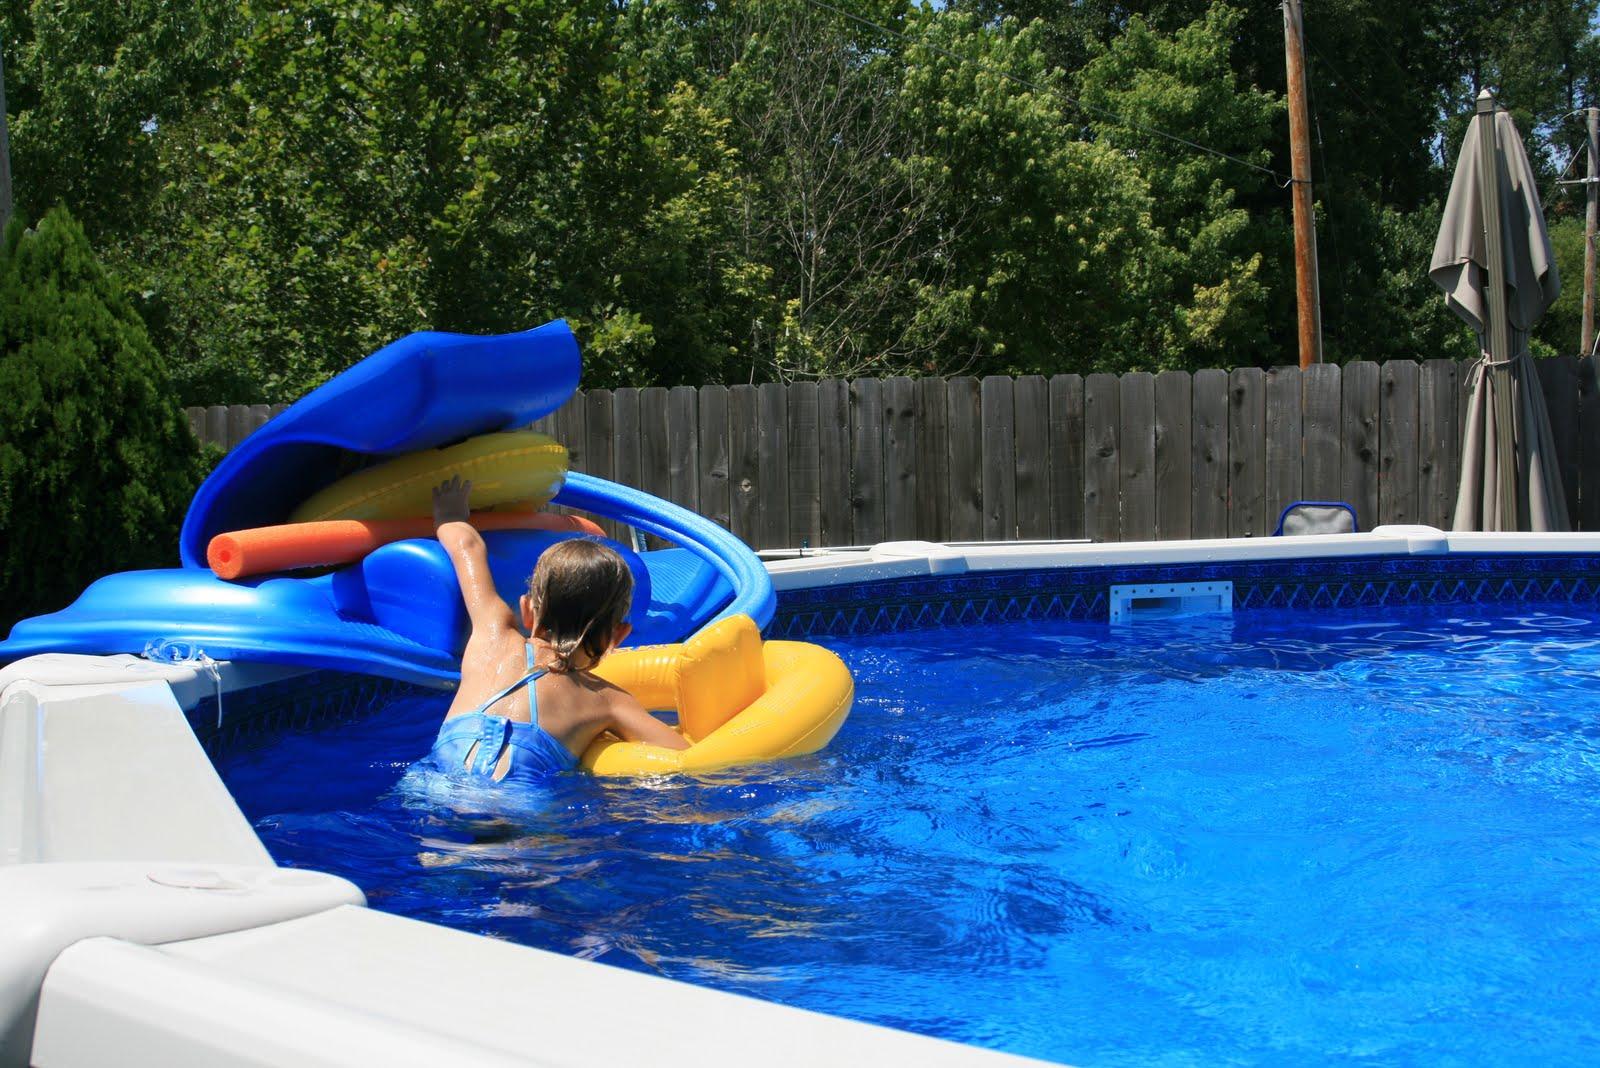 mini swimming pool for kids photo - 1